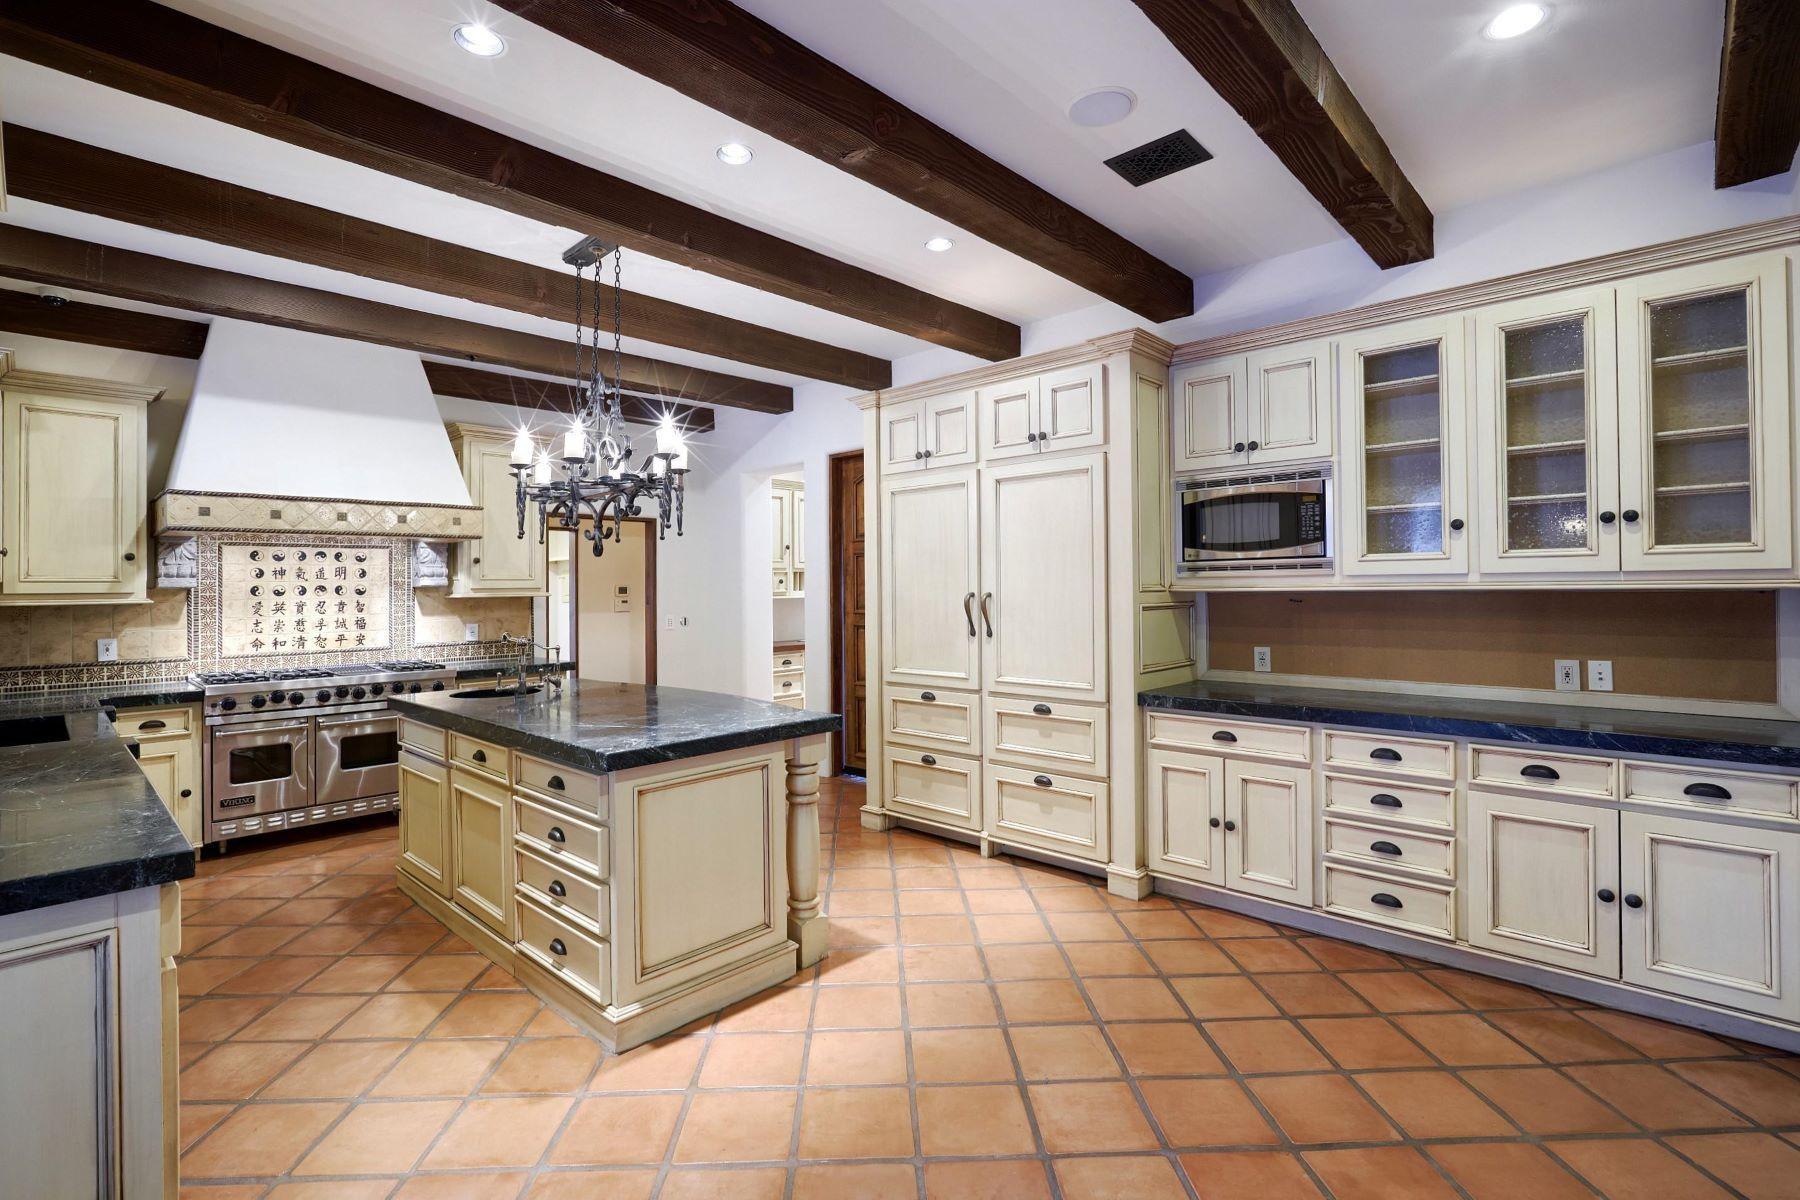 Additional photo for property listing at 5239 Roadrunner, Paradise Valley, AZ 85253 5239 Roadrunner 天堂谷, 亚利桑那州 85253 美国